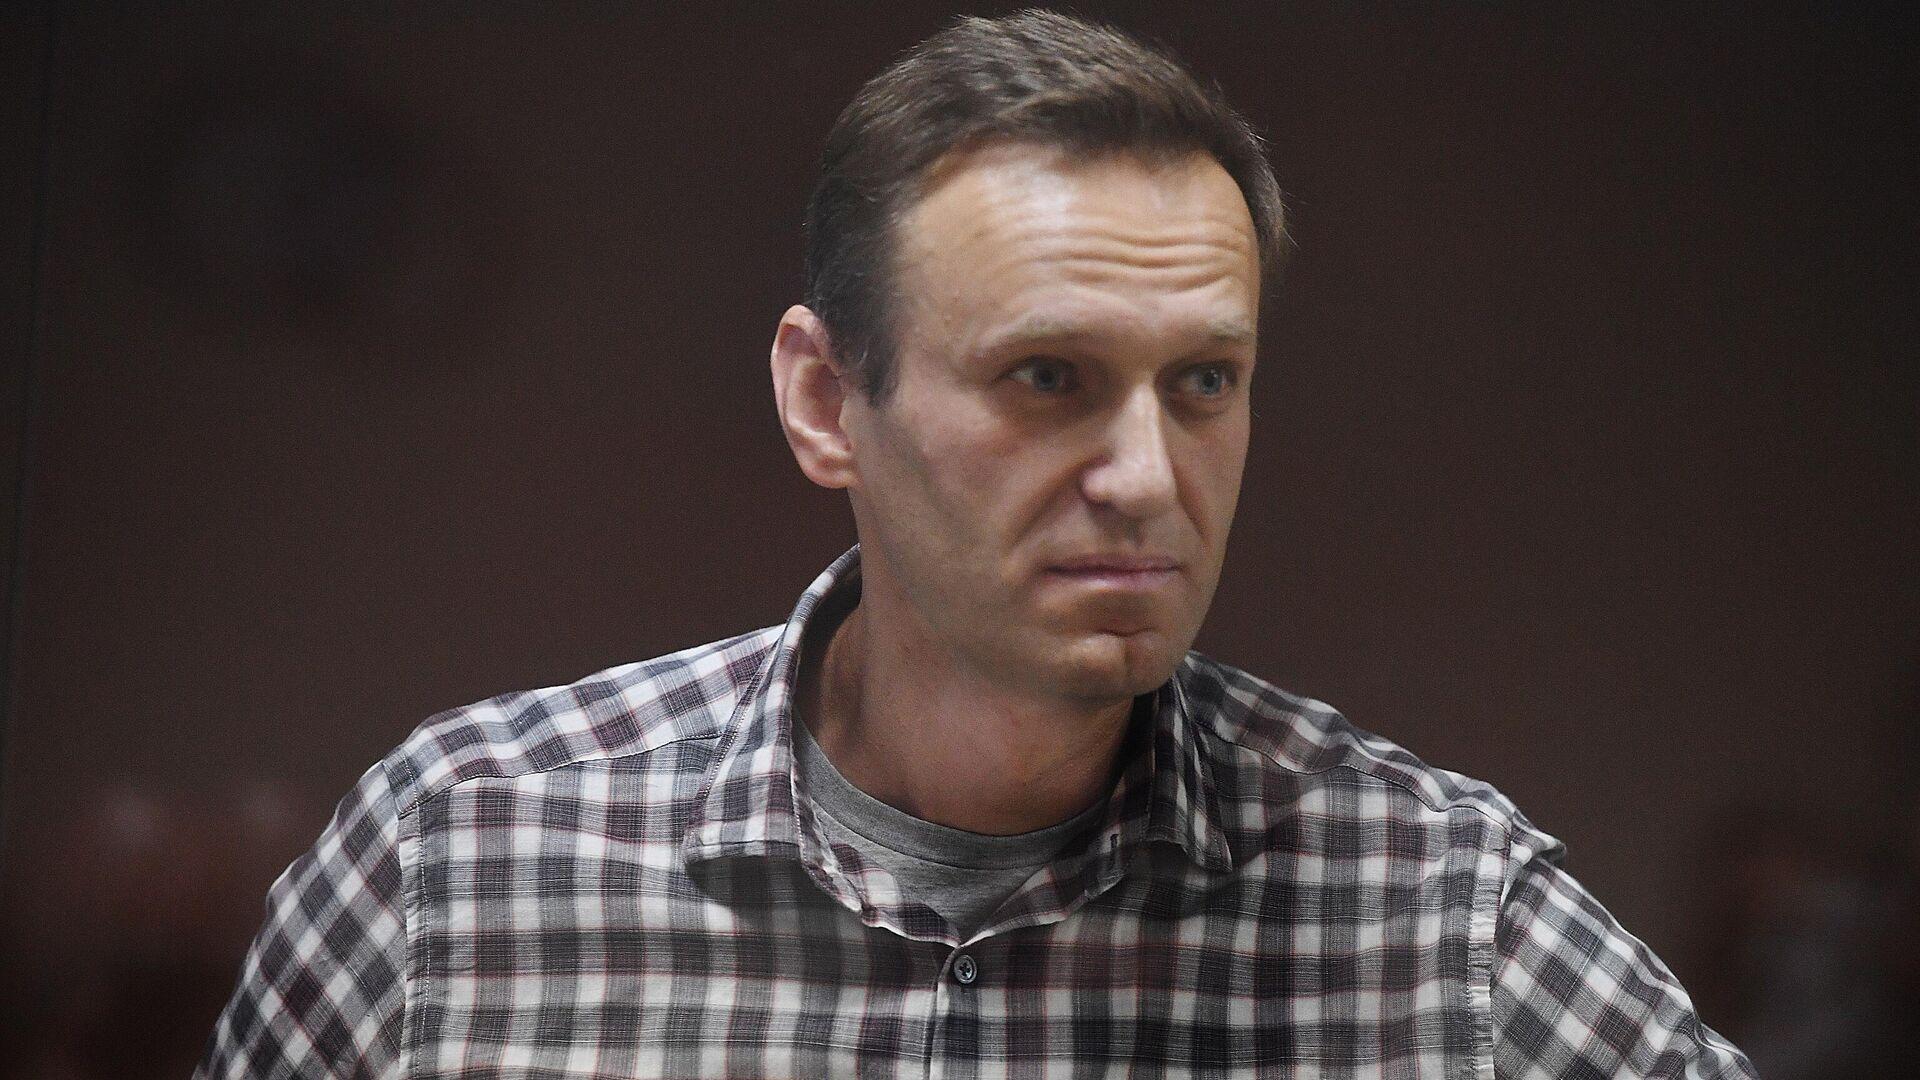 Alexéi Navalni, bloguero opositor ruso - Sputnik Mundo, 1920, 06.09.2021